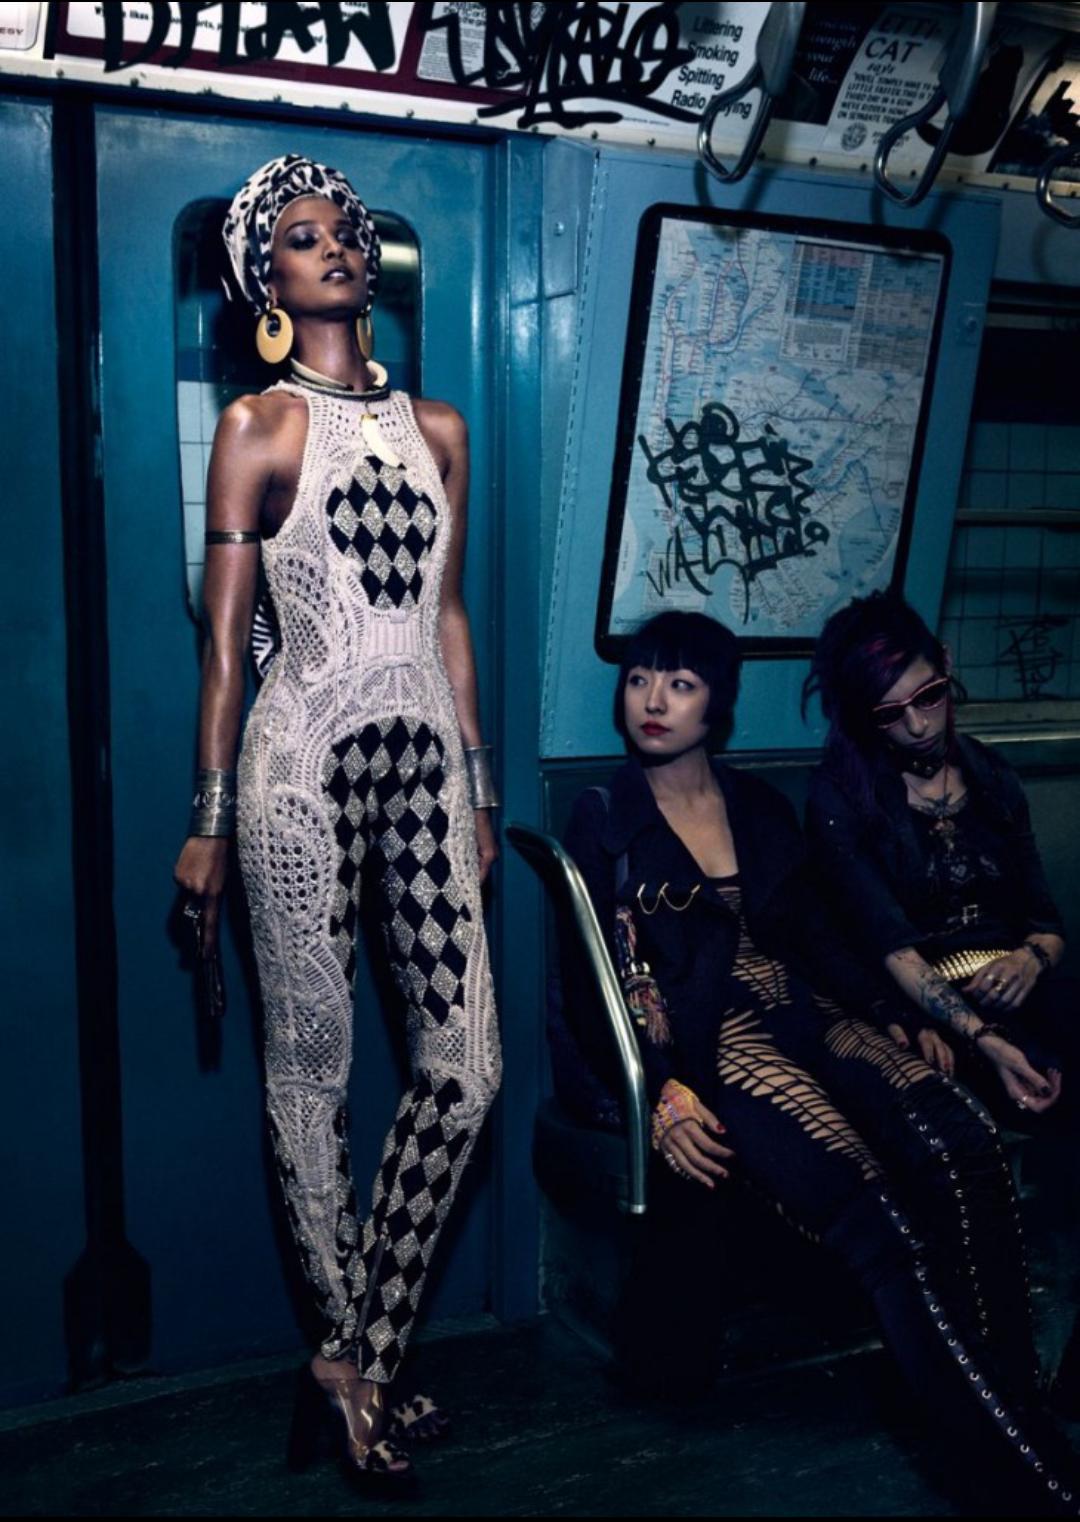 Liya Kebede by Mikael Jansson for Vogue Japan April 2013